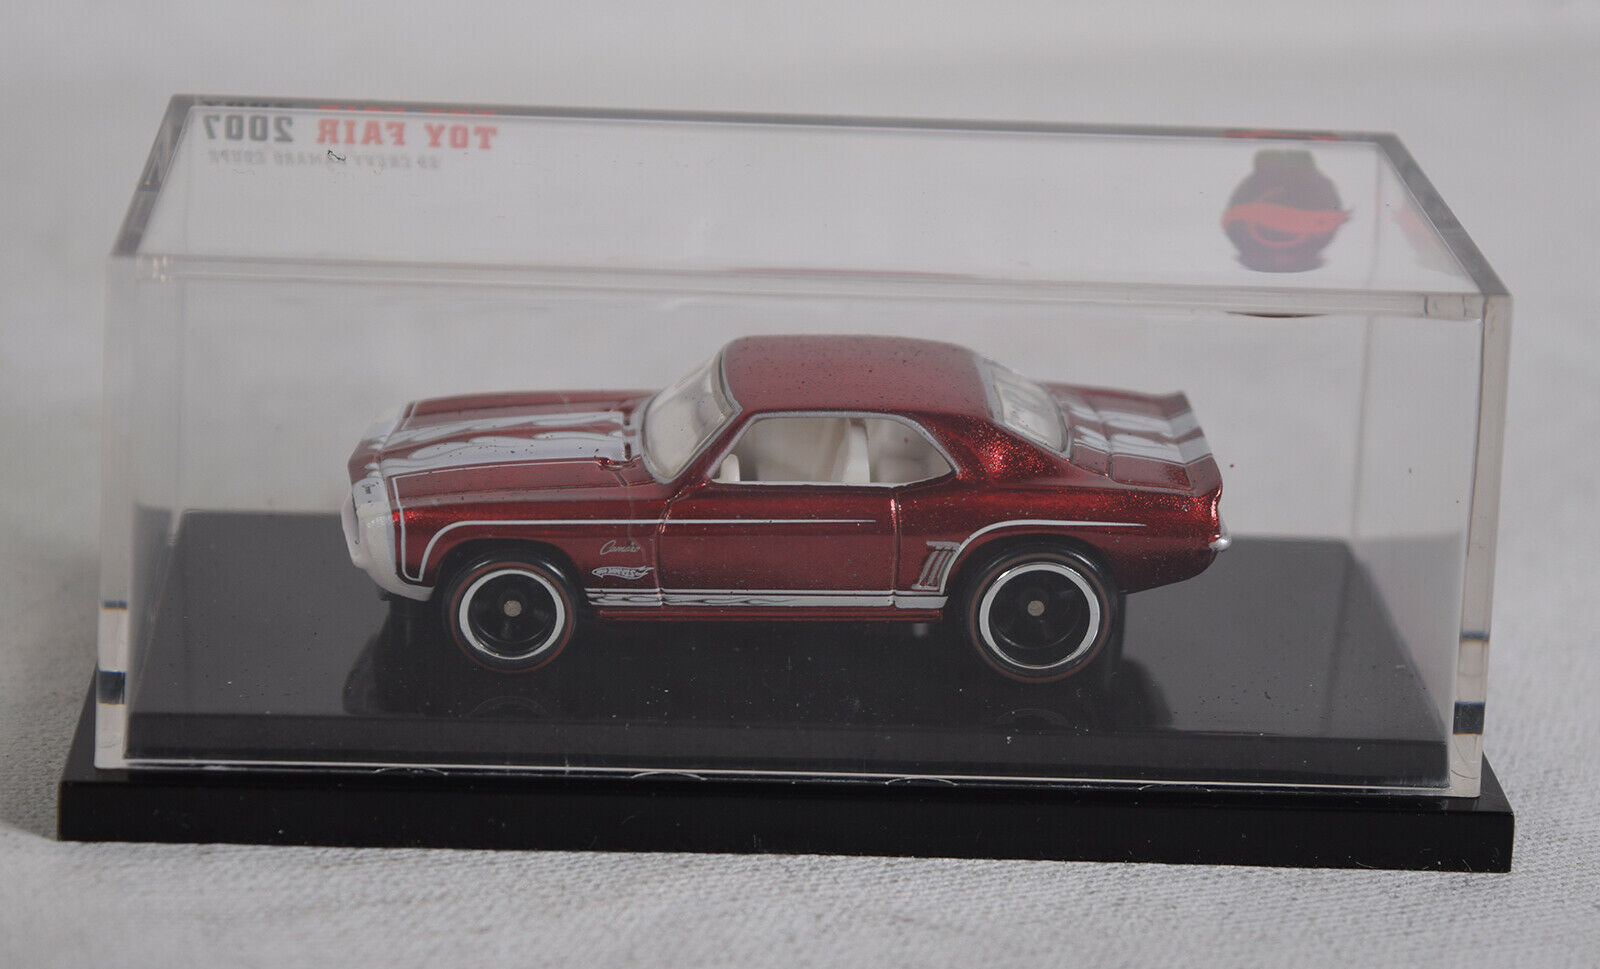 Hot Wheels '69 Chevy Camaro Coupe Toy Fair 2007 Die Cast Car